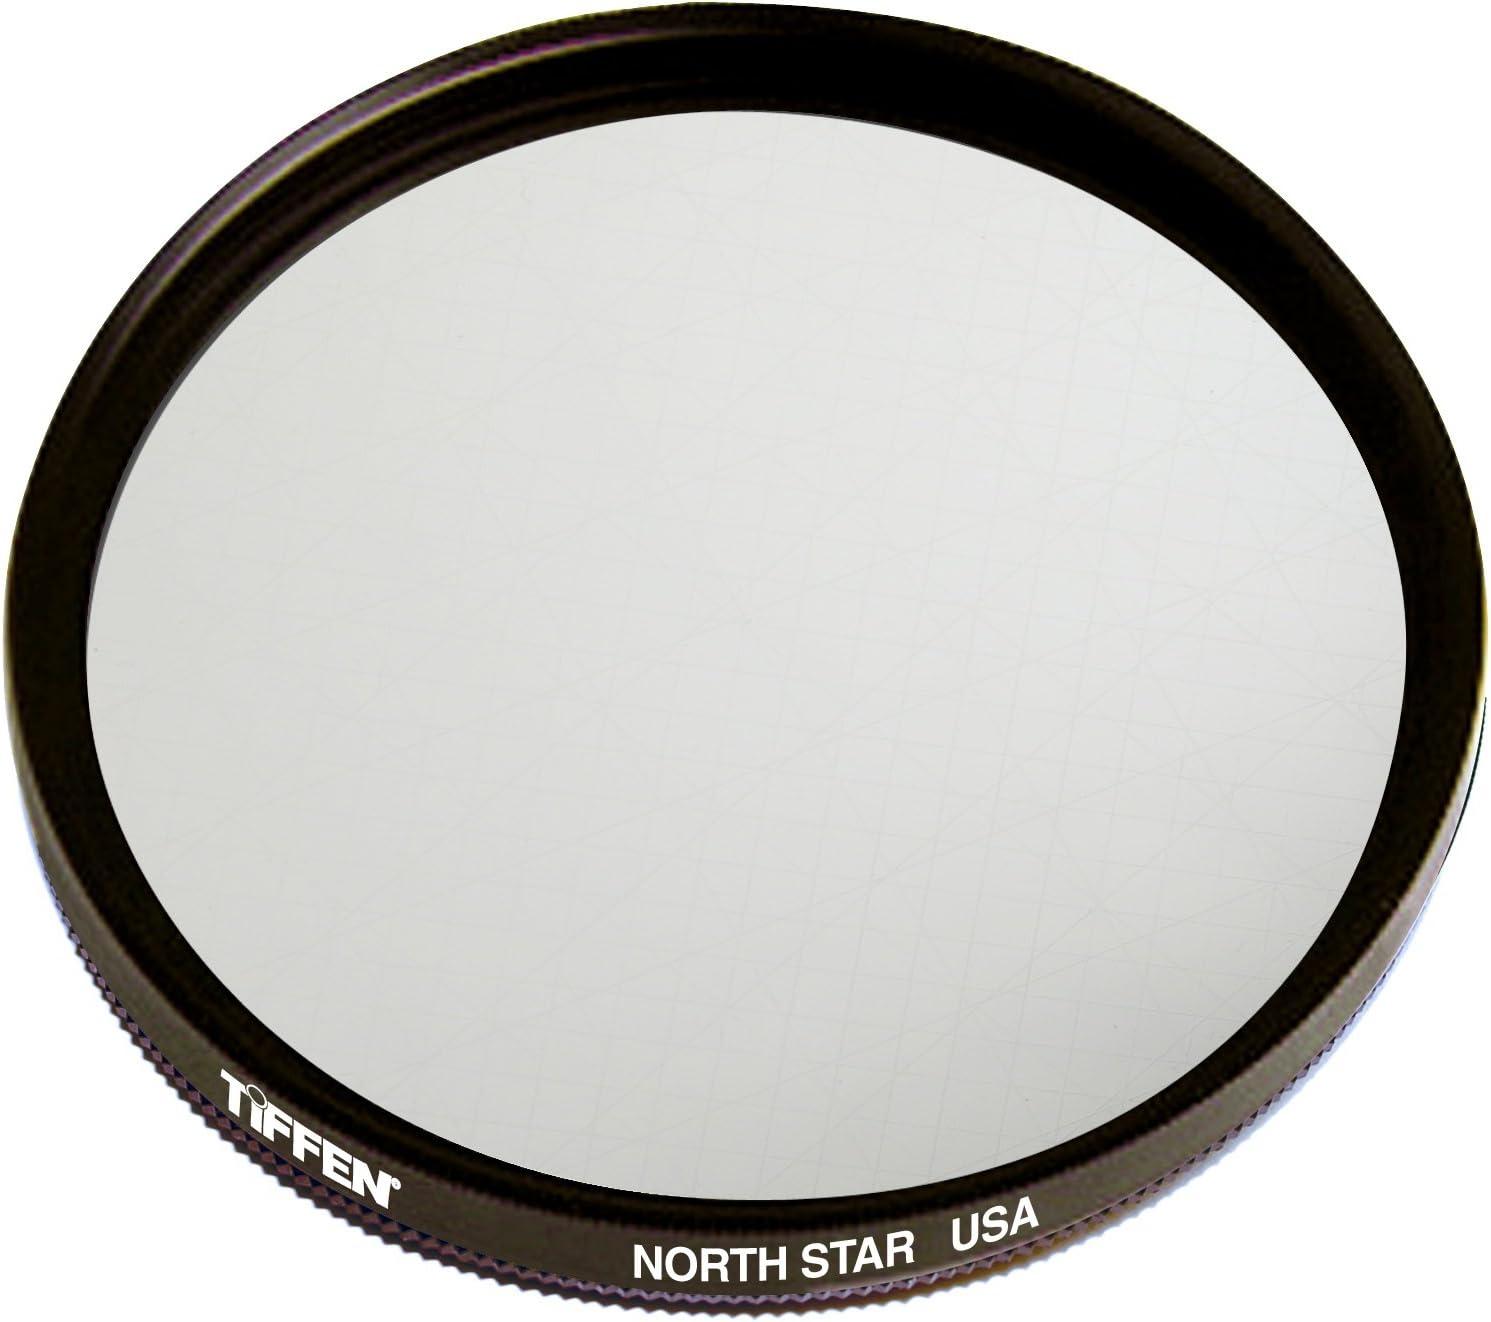 Tiffen 55NSTR 55mm North Star Filter